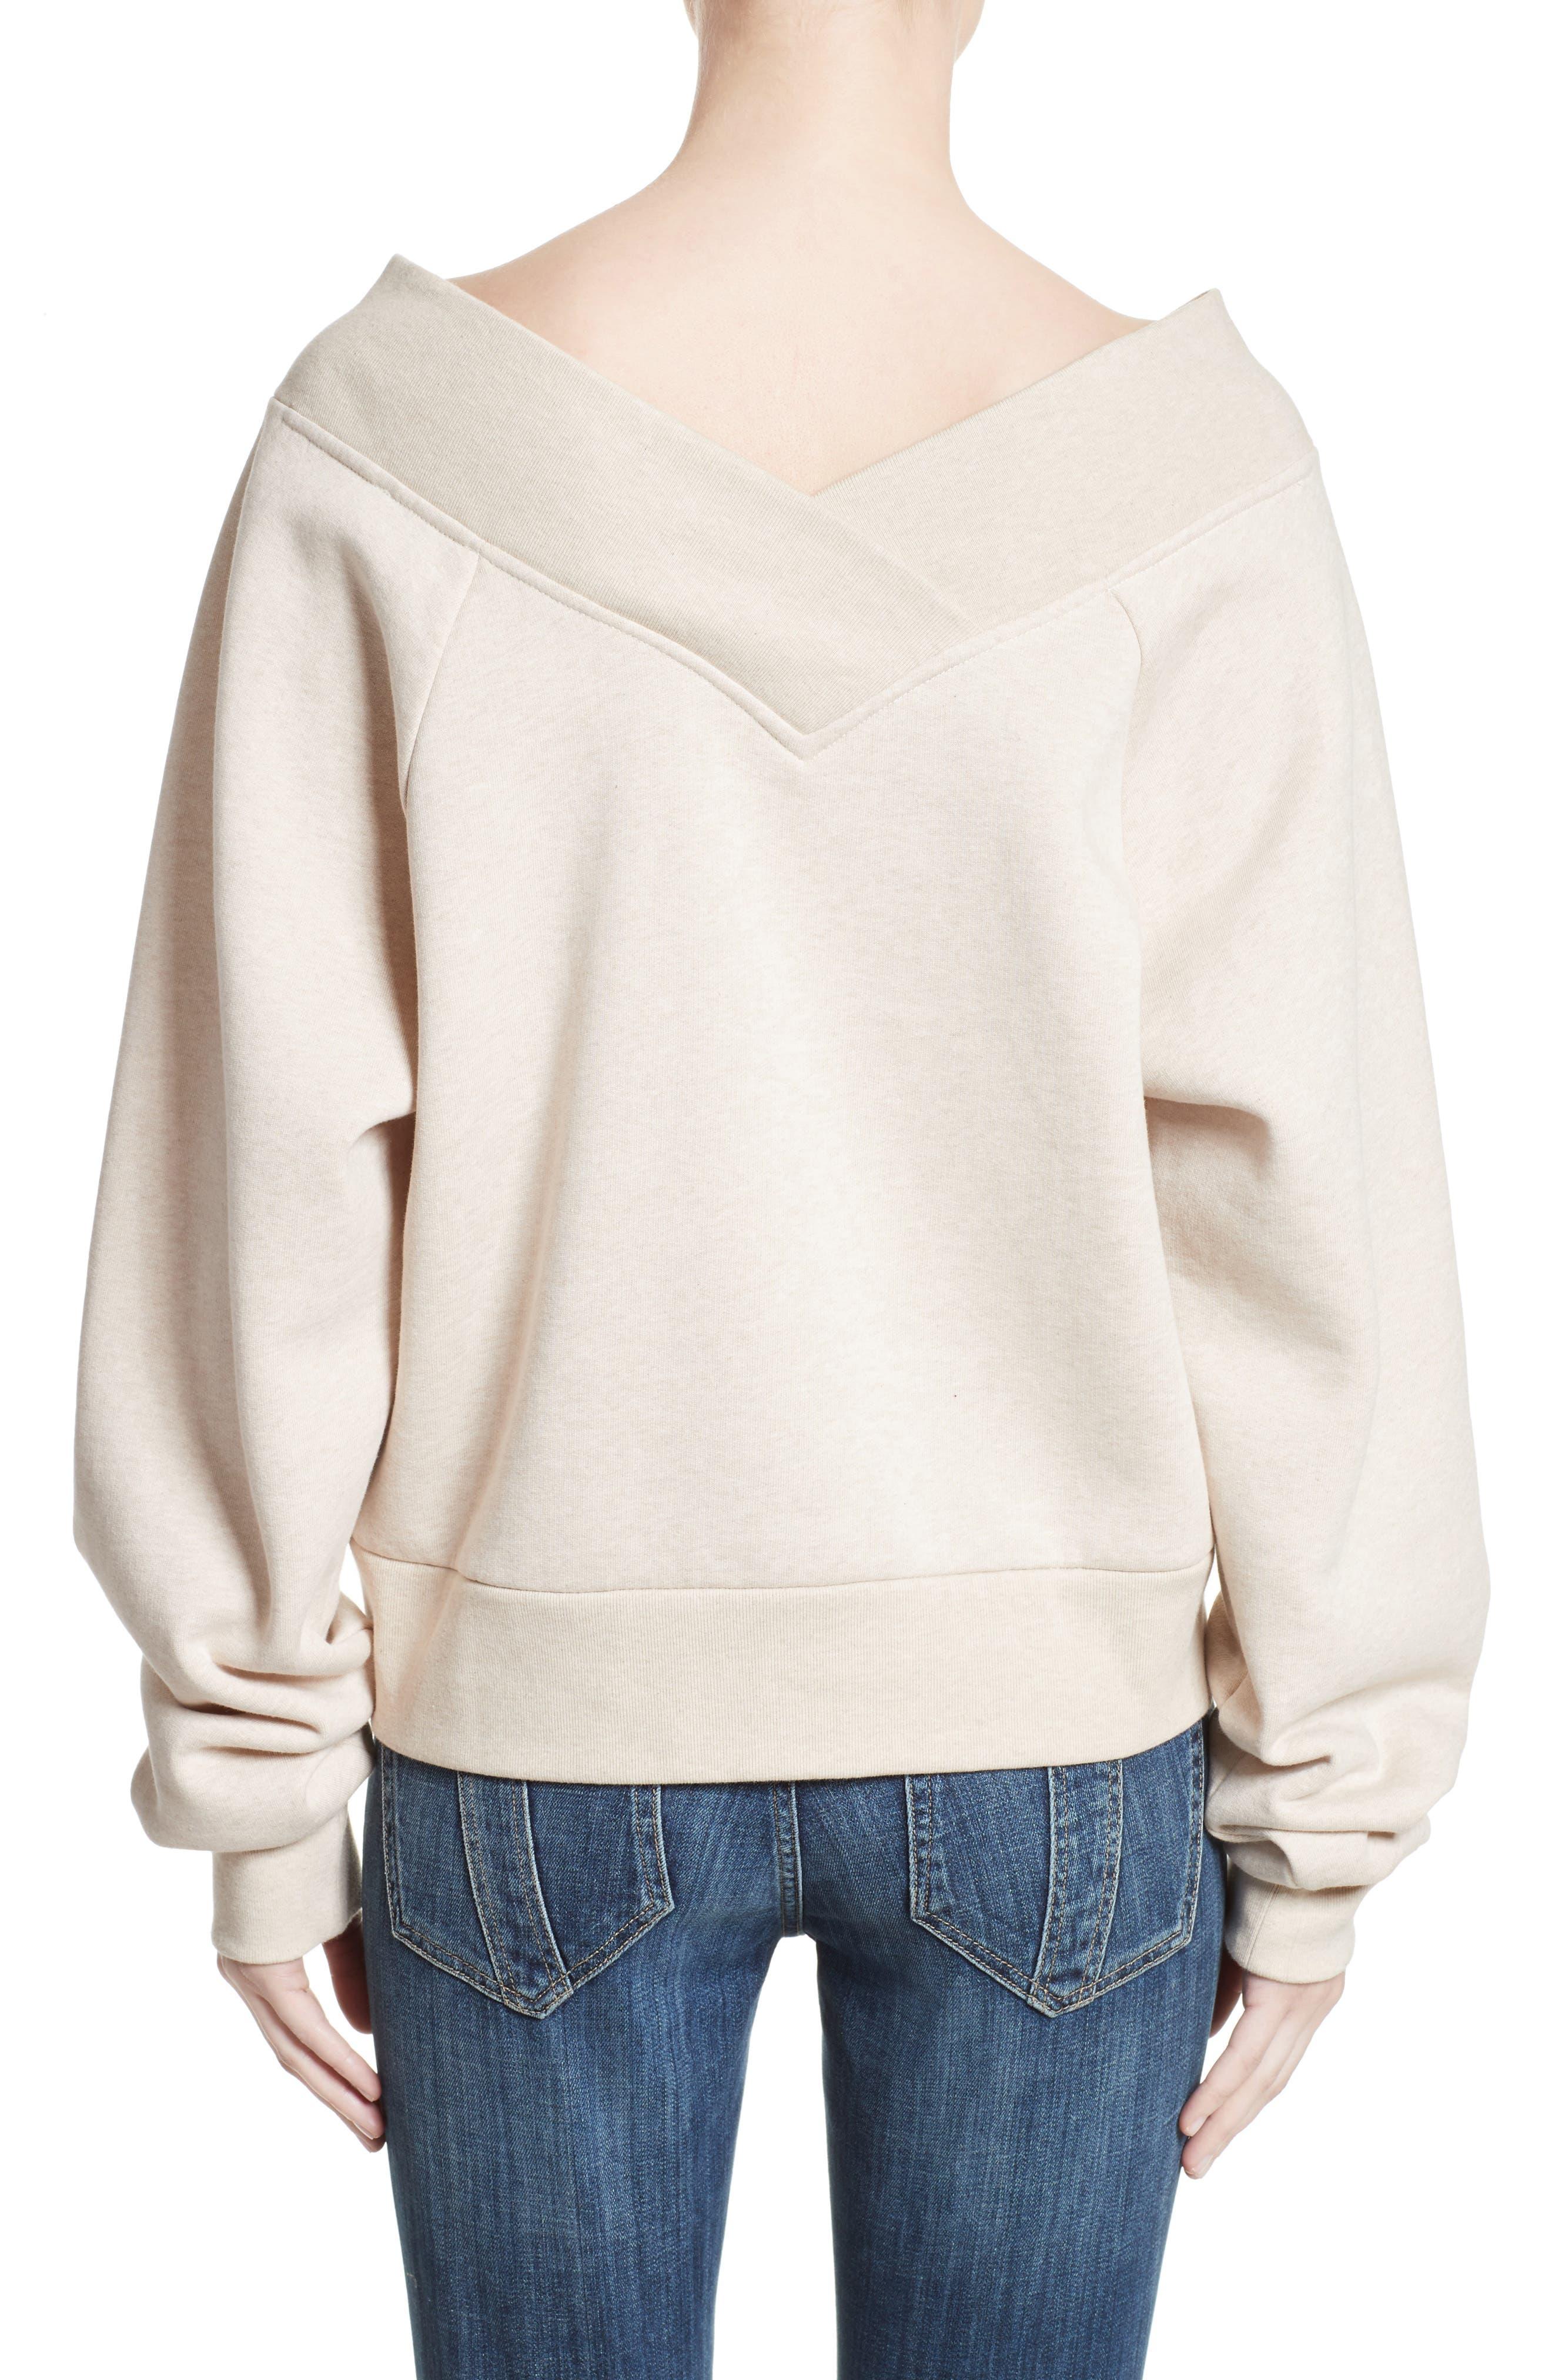 Falacho V-Neck Sweatshirt,                             Alternate thumbnail 2, color,                             250